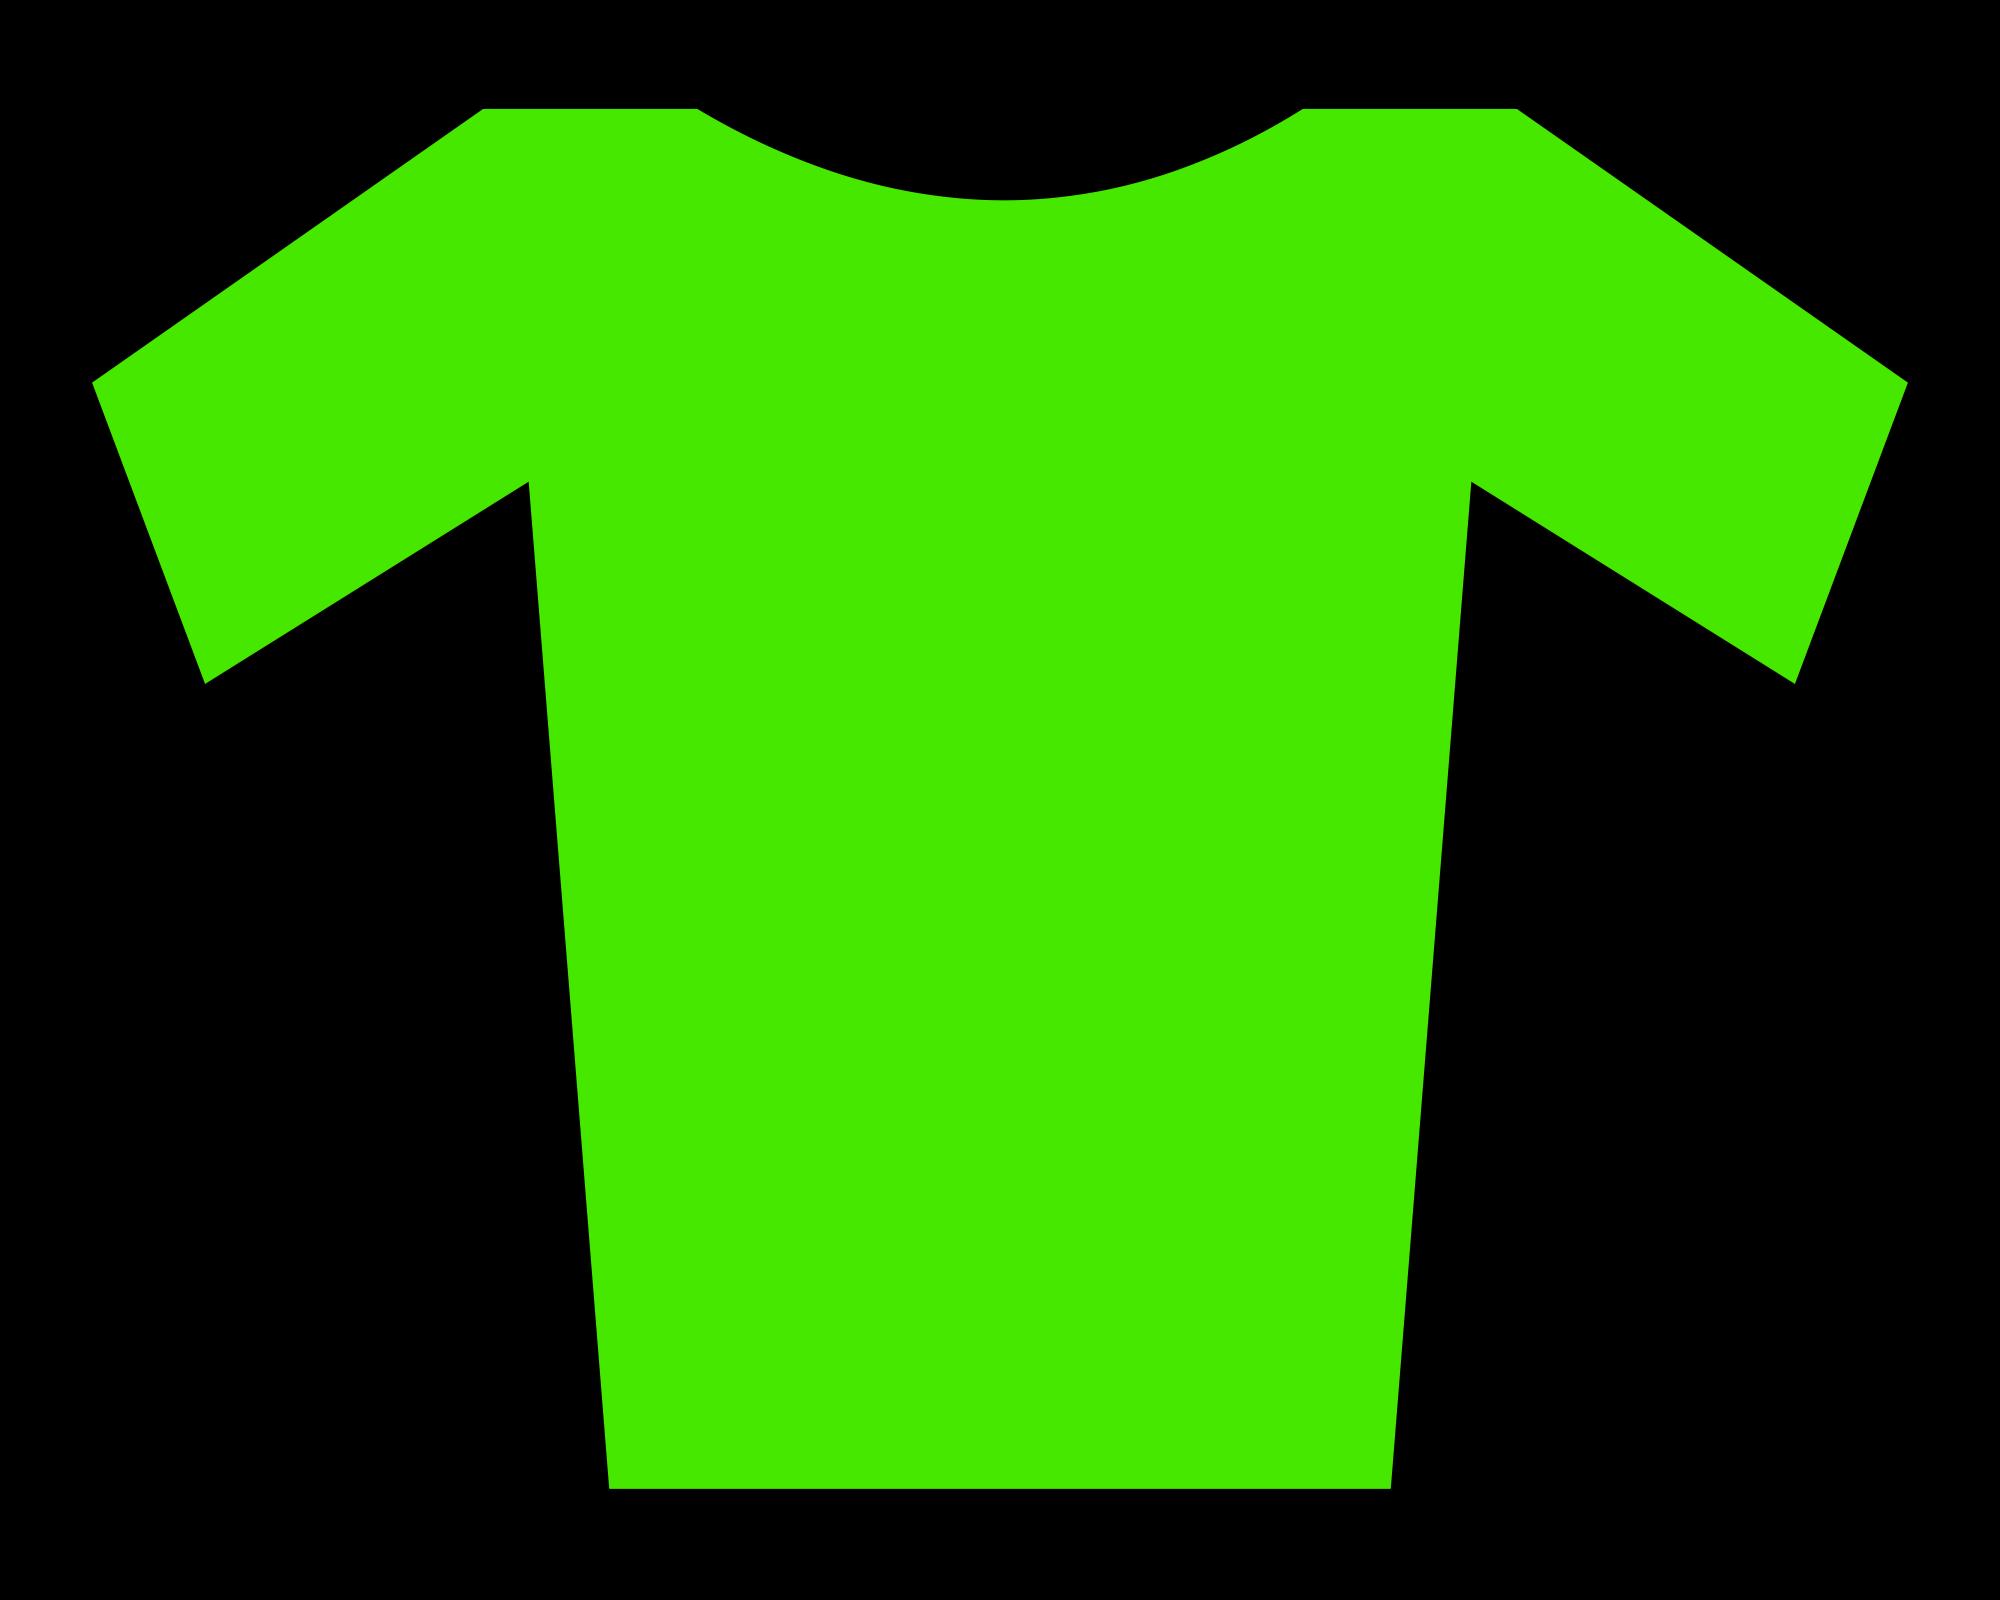 File jersey svg wikimedia. Clipart shirt green shirt